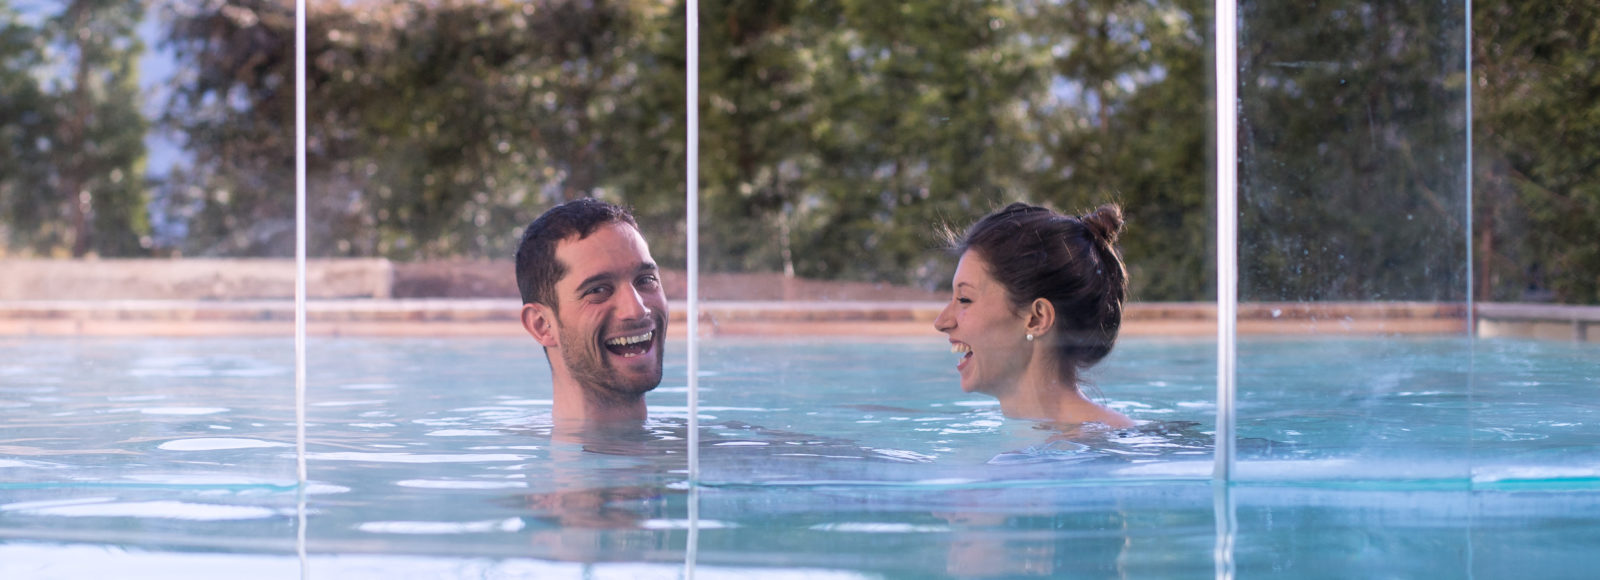 La nostra piscina esterna per la tua vacanza perfetta